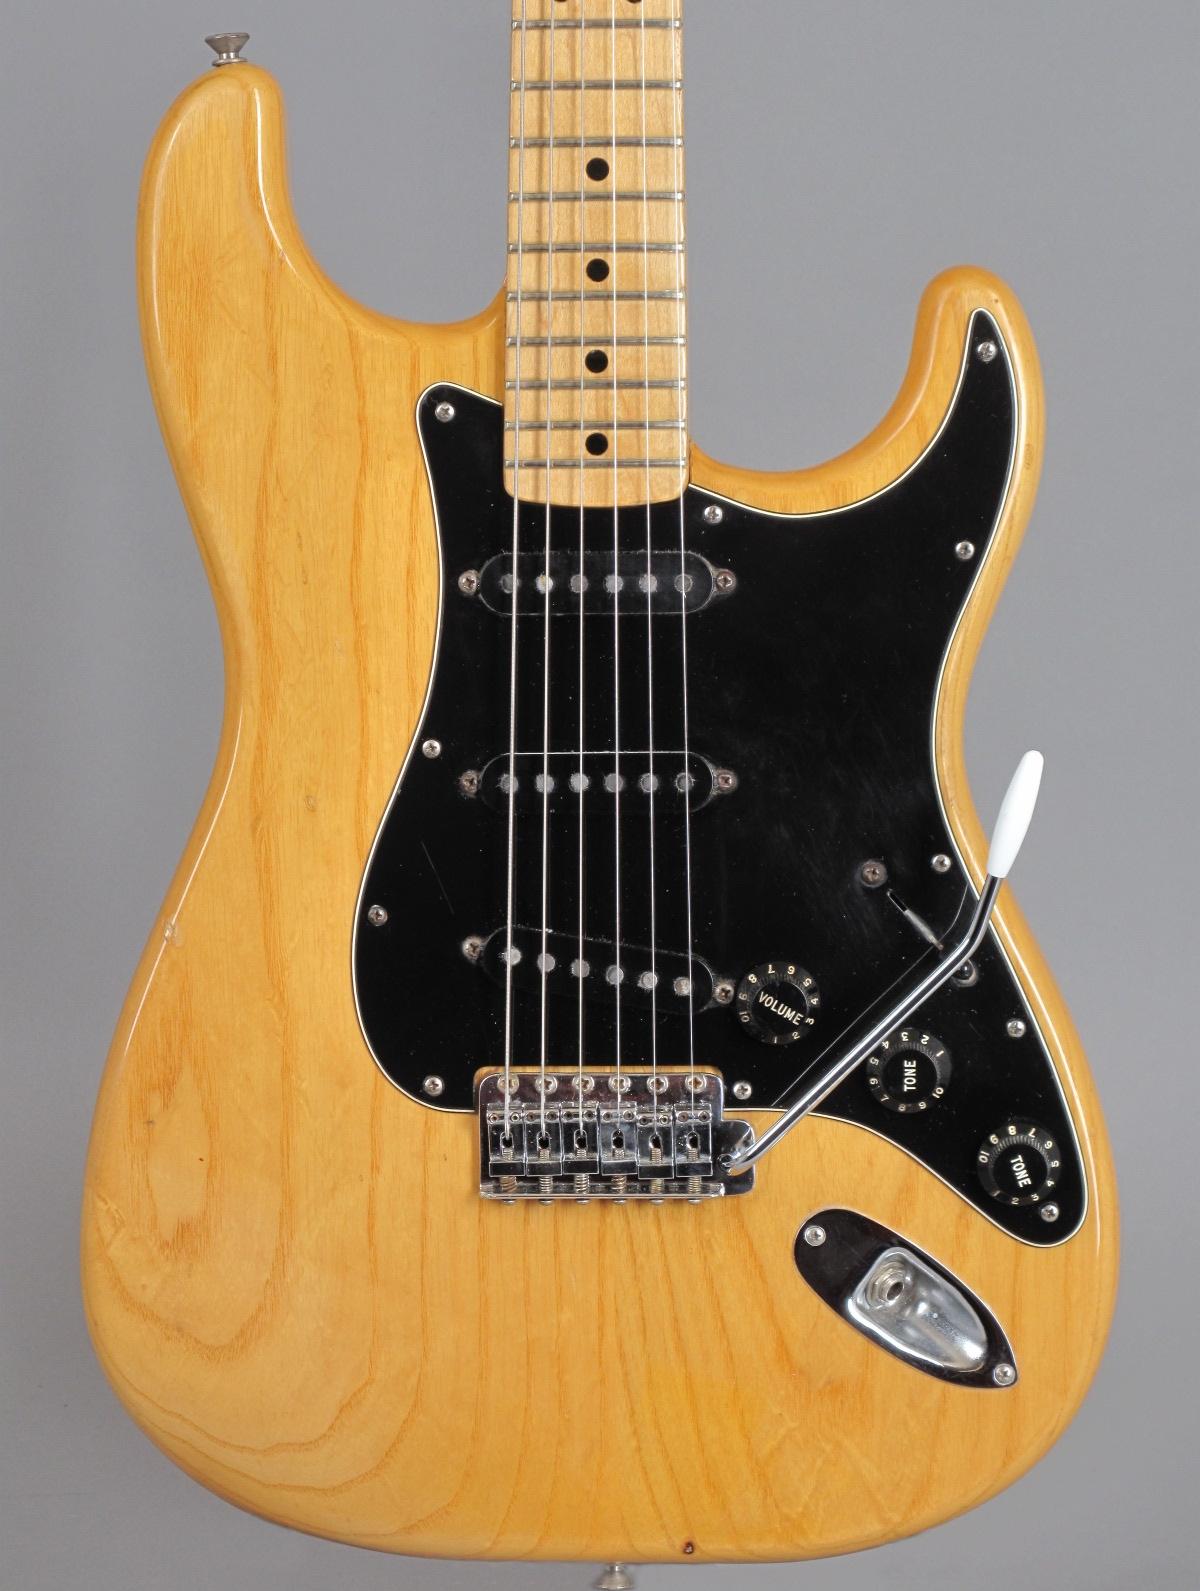 1977 Fender Stratocaster - Natural